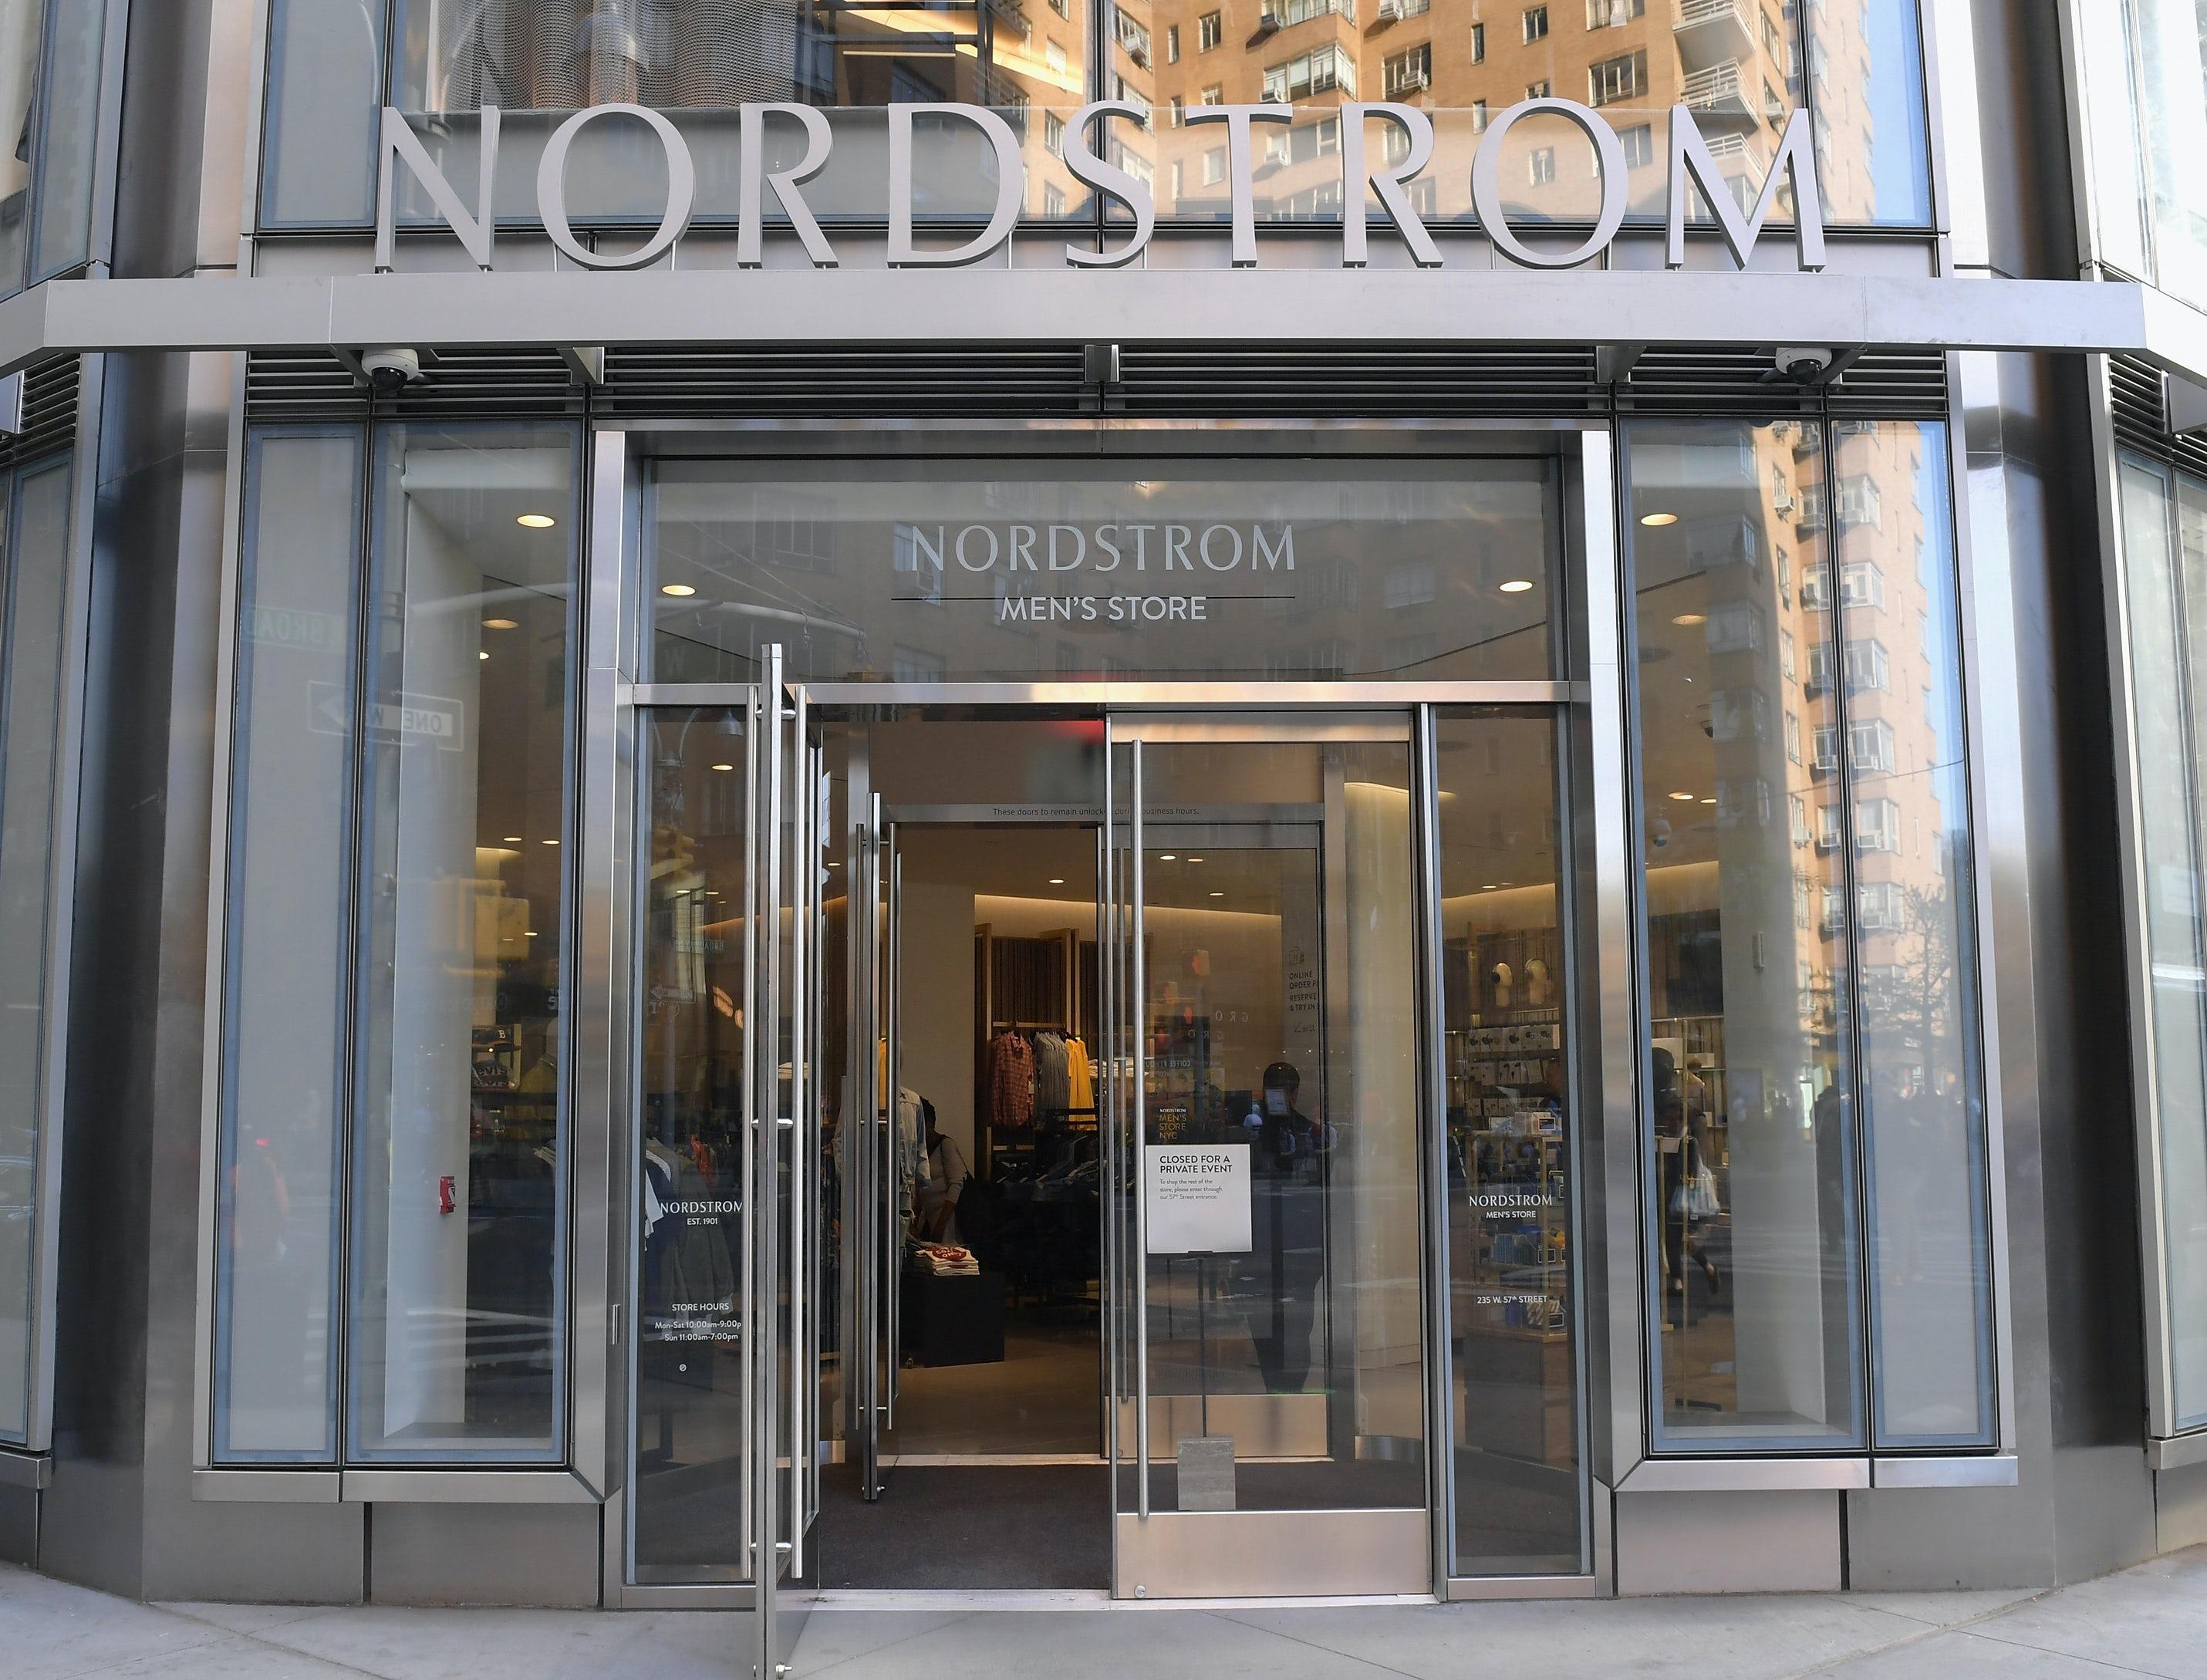 Nordstrom Men's Store | Source: Courtesy